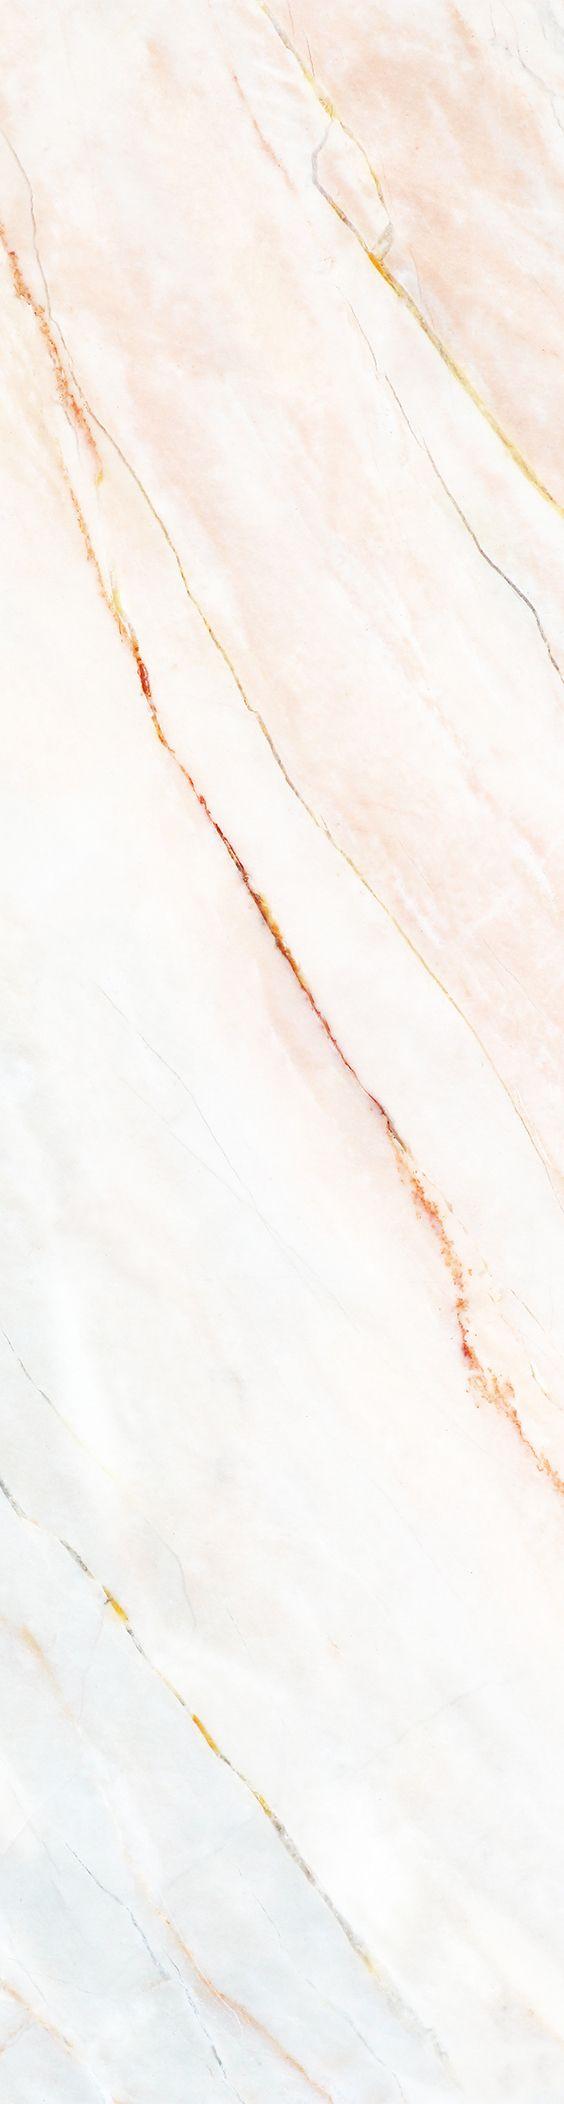 Blush Pink Fade Marble Wallpaper Murals Wallpaper Pink Marble Wallpaper Marble Iphone Wallpaper Marble Wallpaper